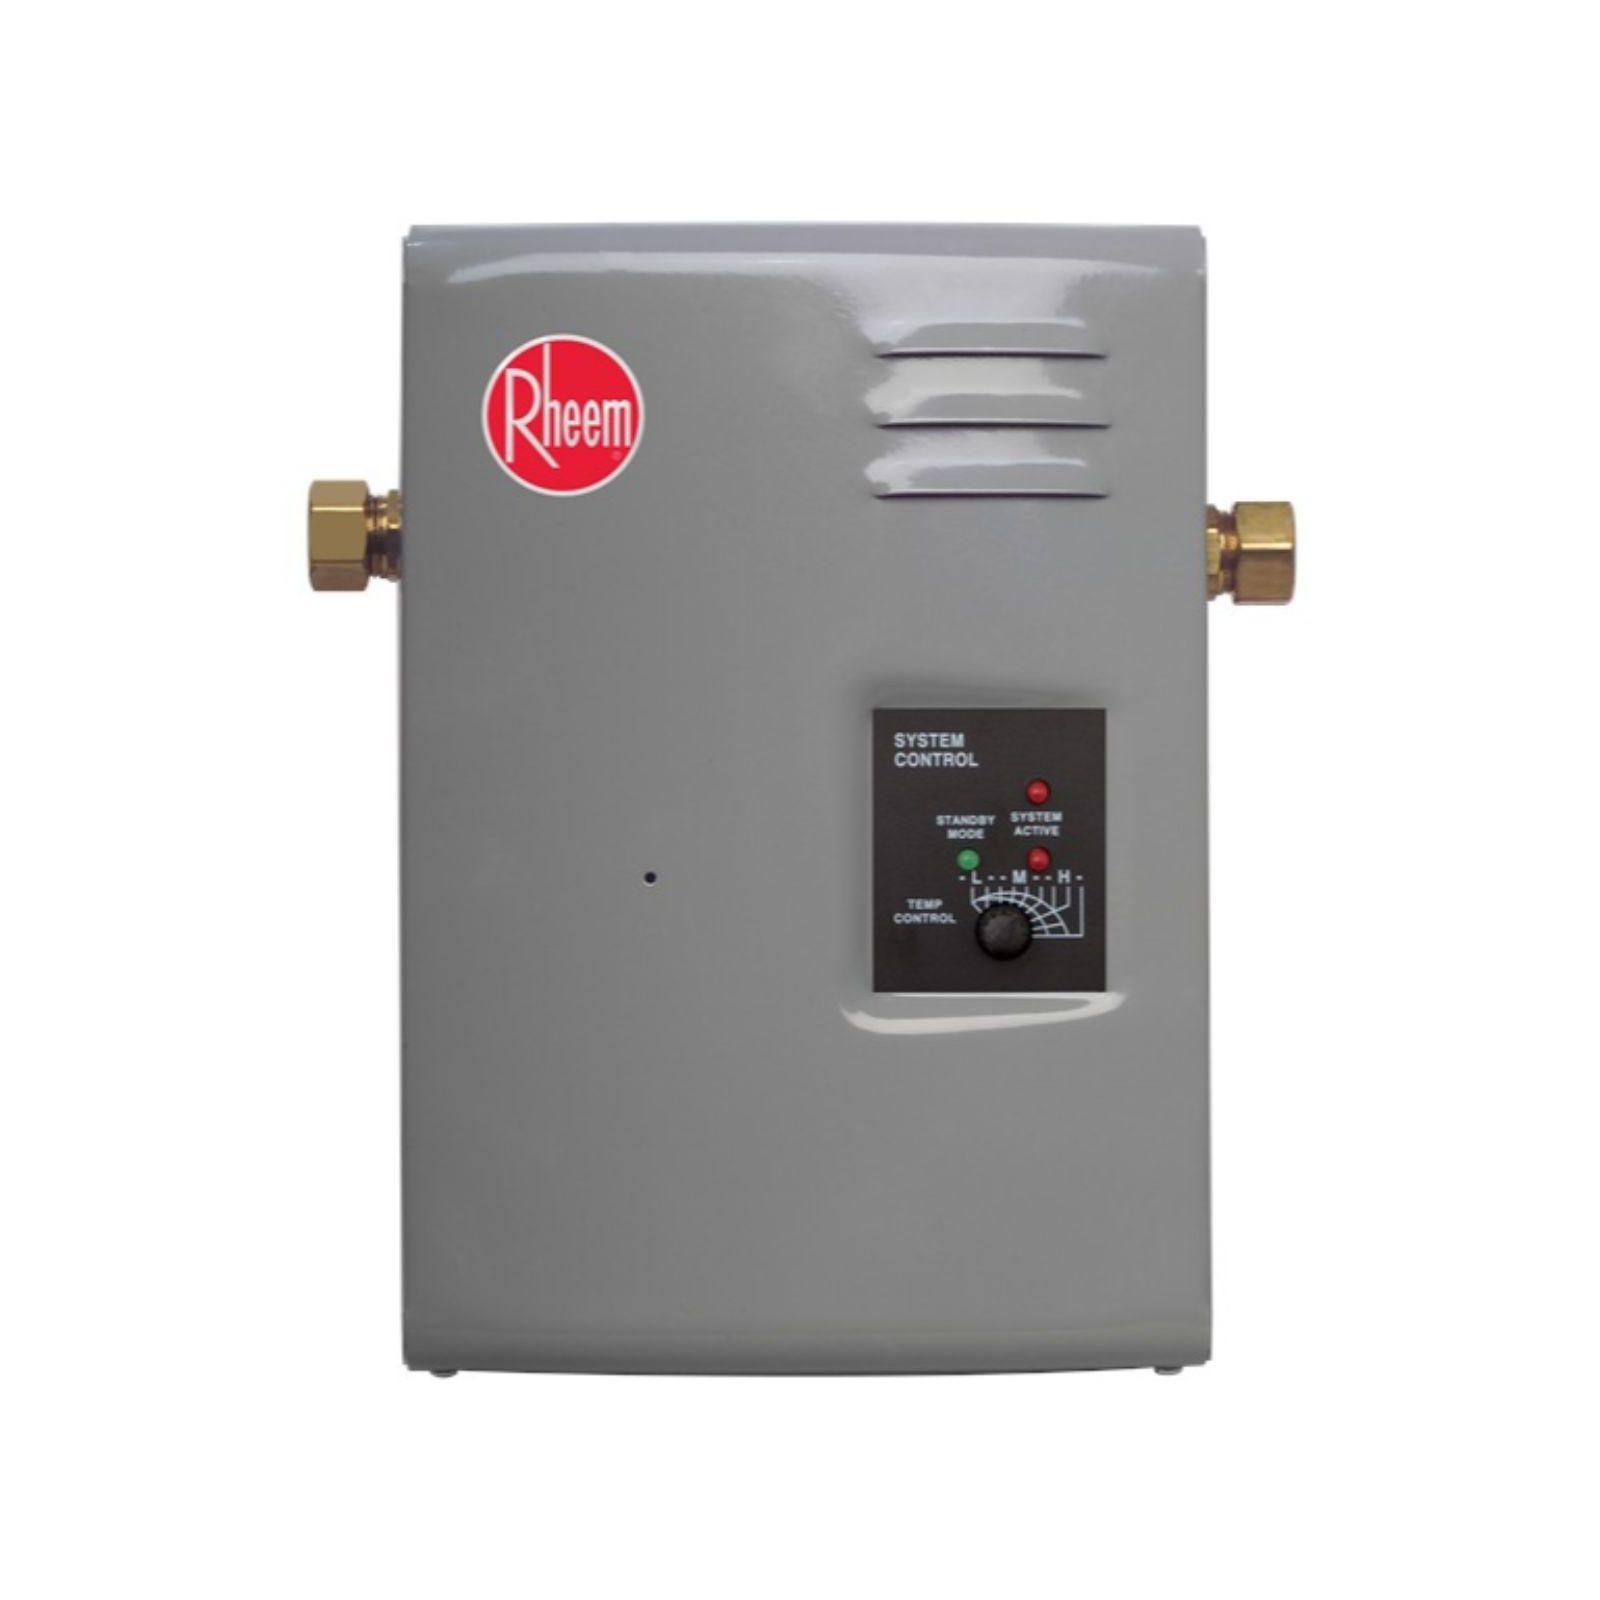 Rheem 591605 - RTE 7 - Tankless Electric Water Heater, 7 kW, 240 Volts